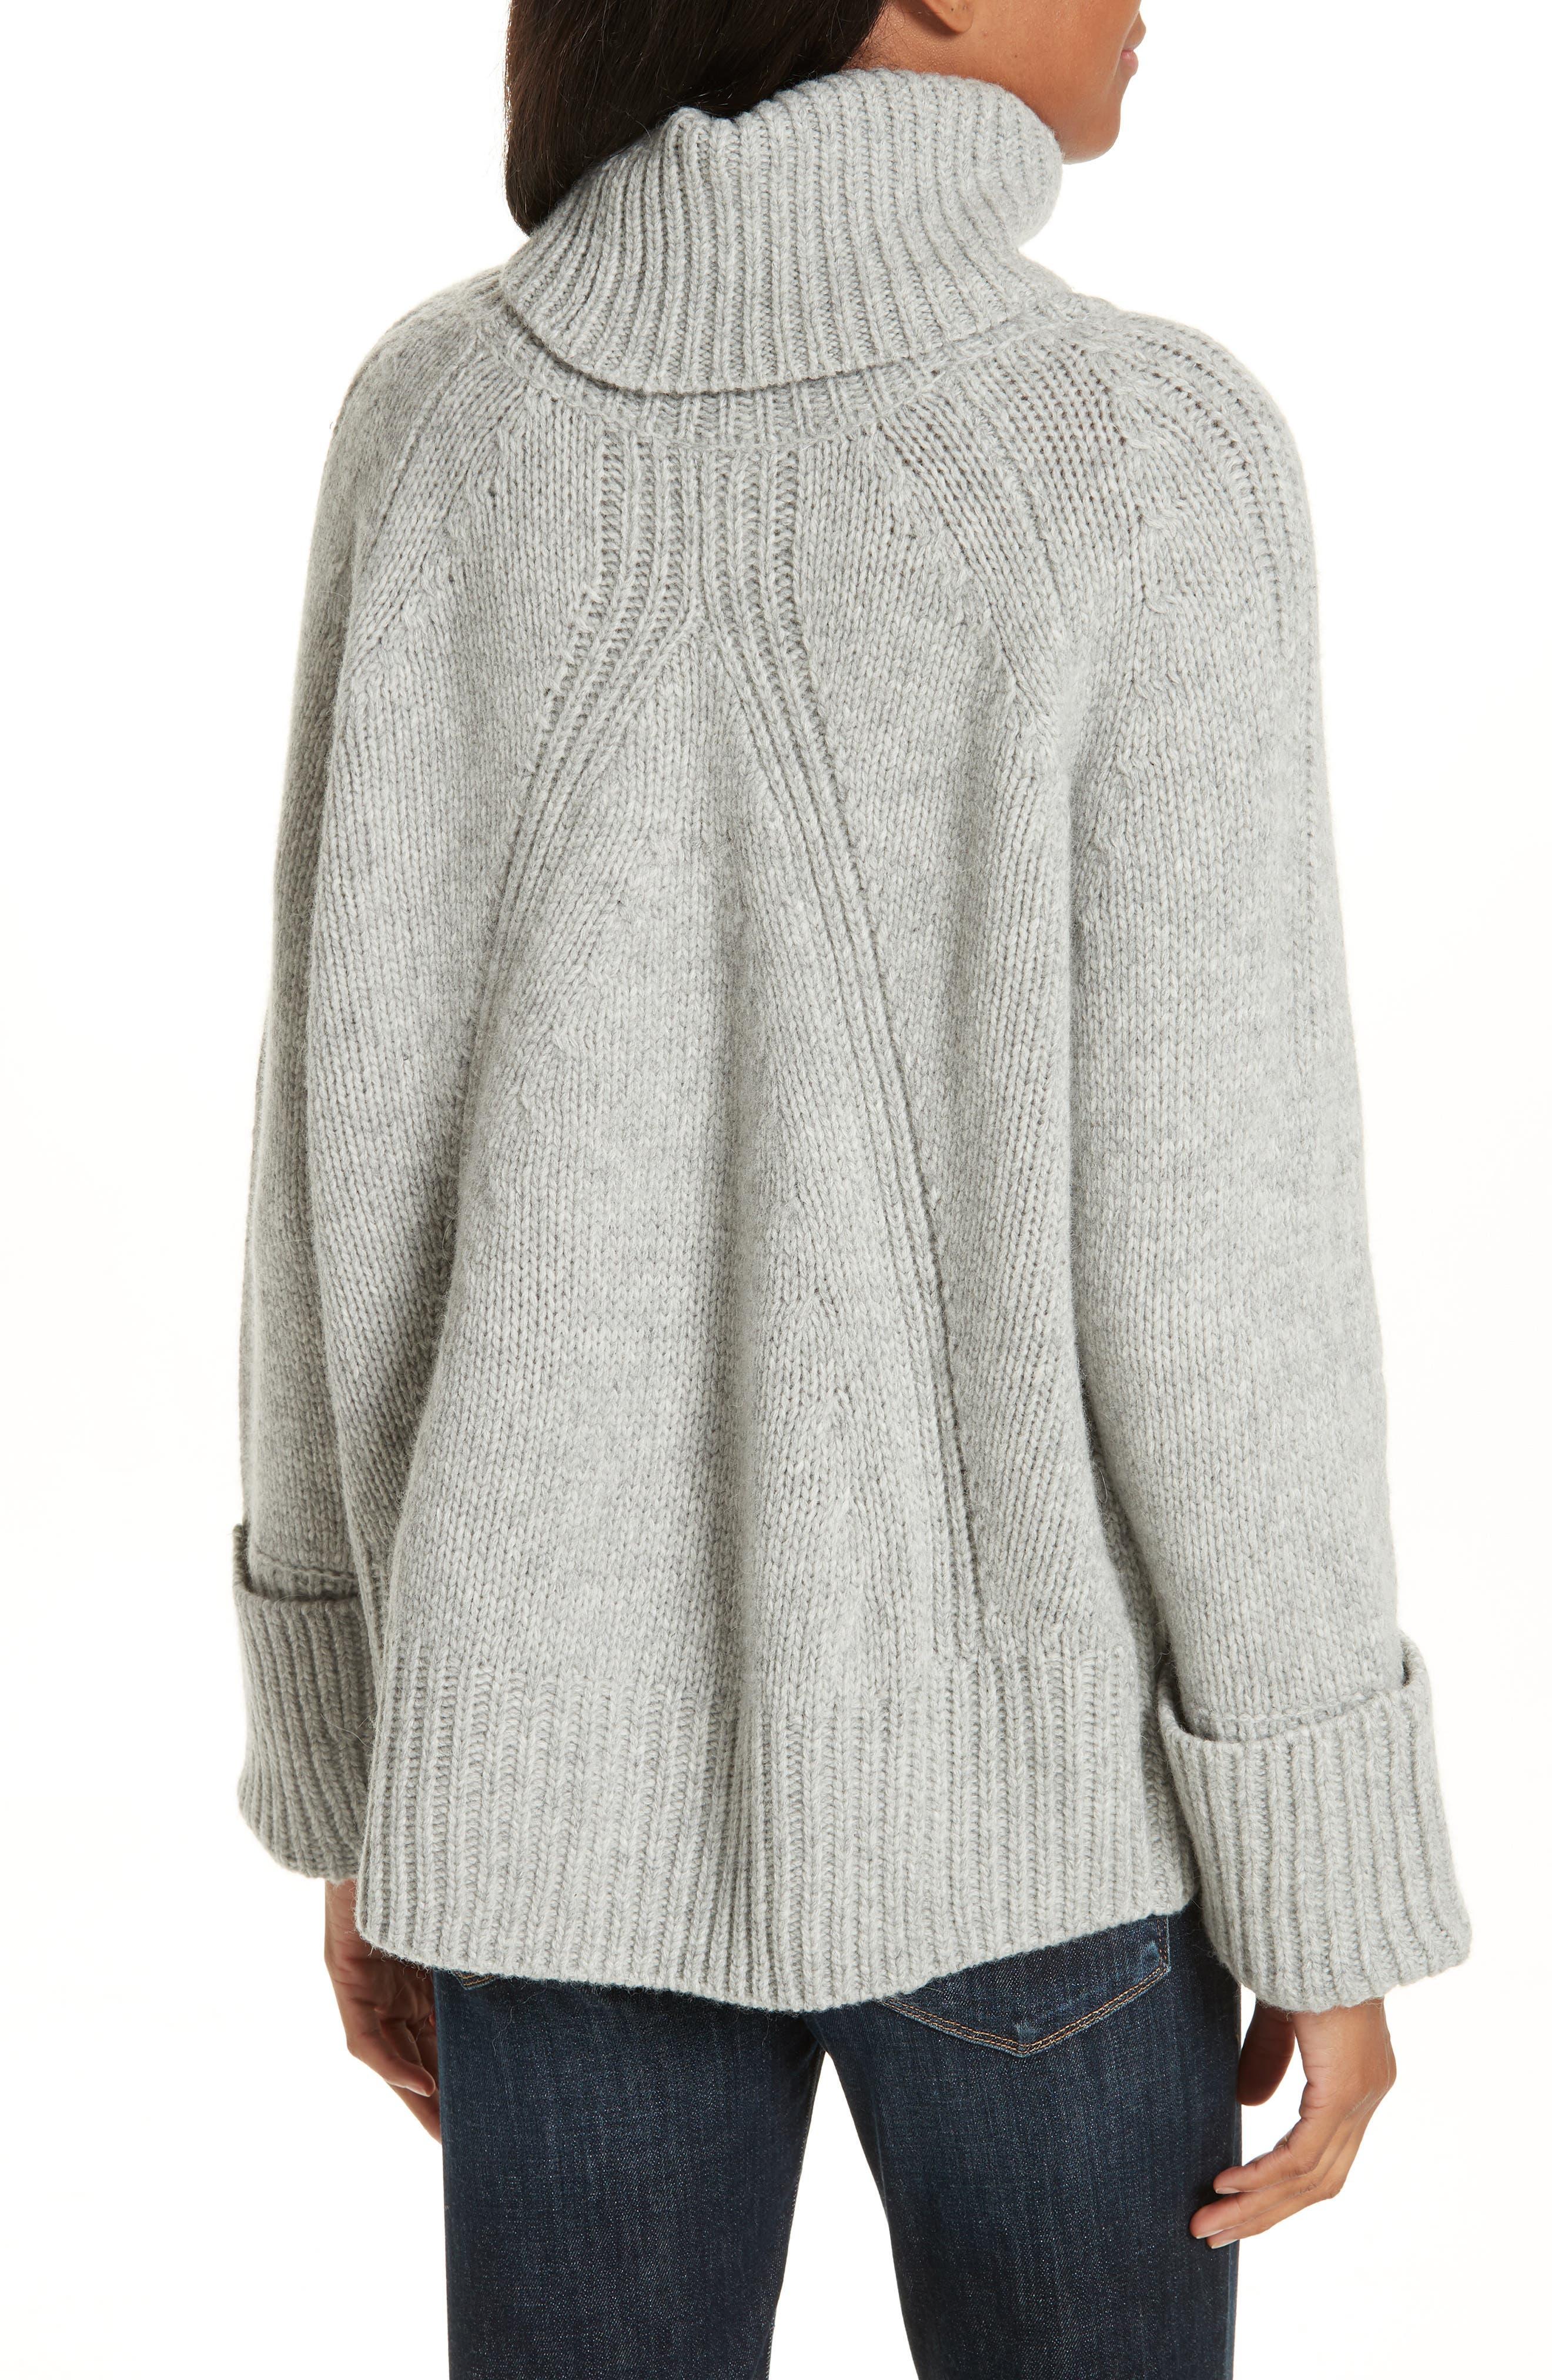 Nagora Sweater,                             Alternate thumbnail 2, color,                             020